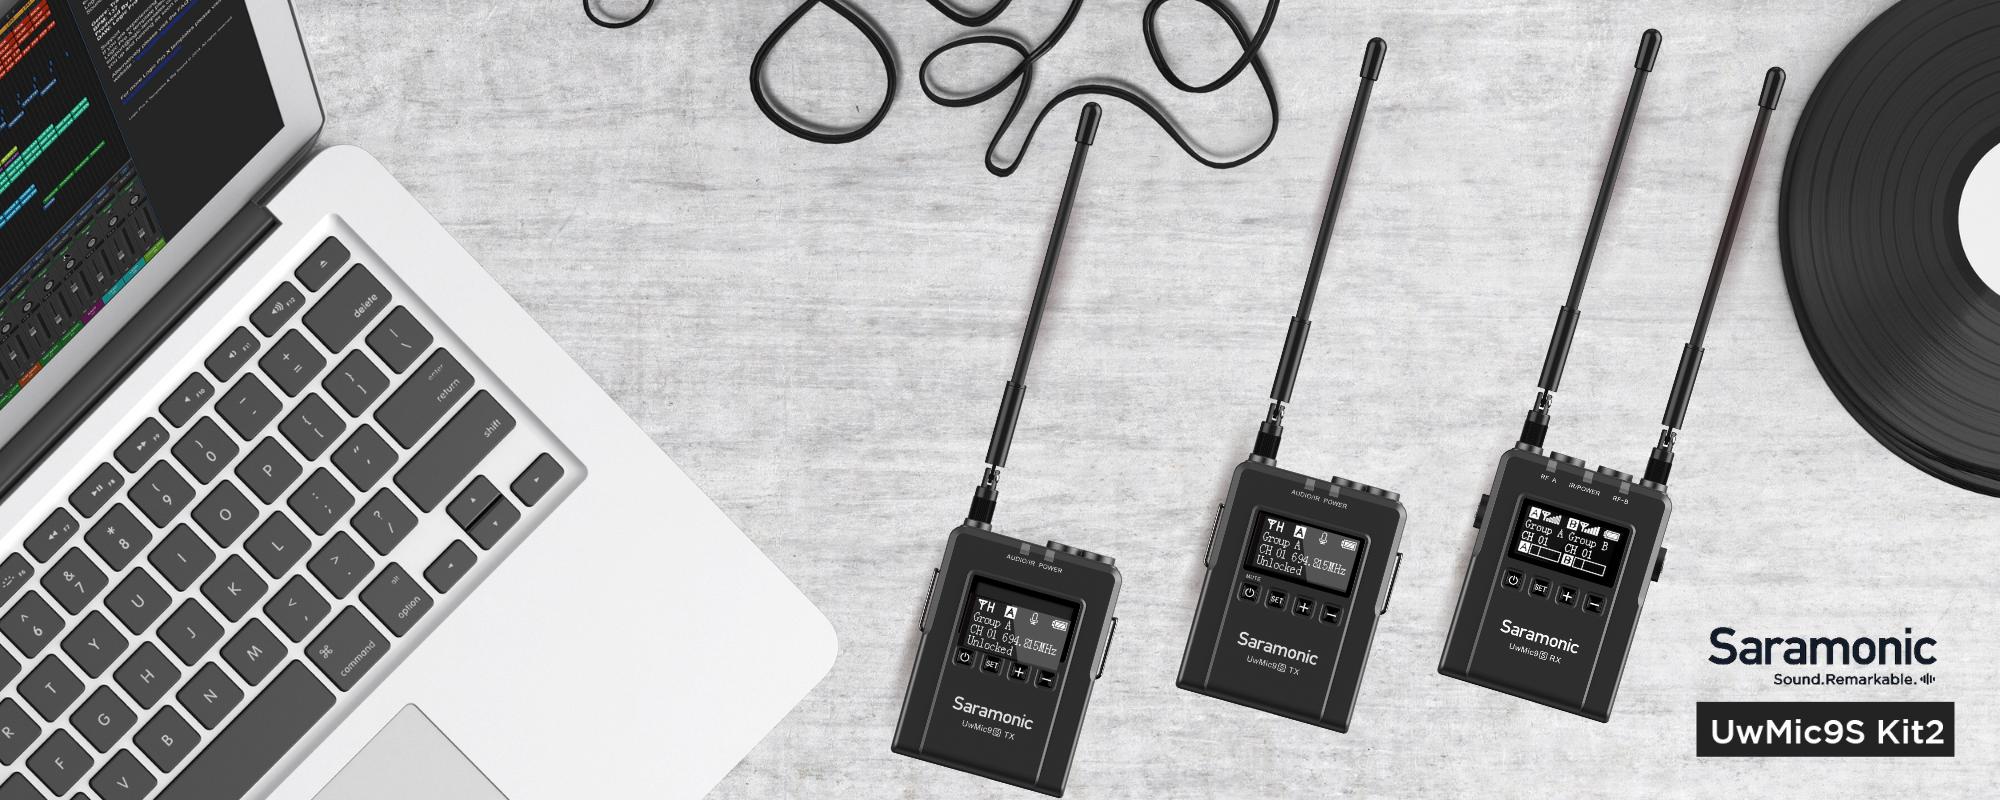 Saramonic Blink500 Pro B1 Wireless Kit (RX + TX)